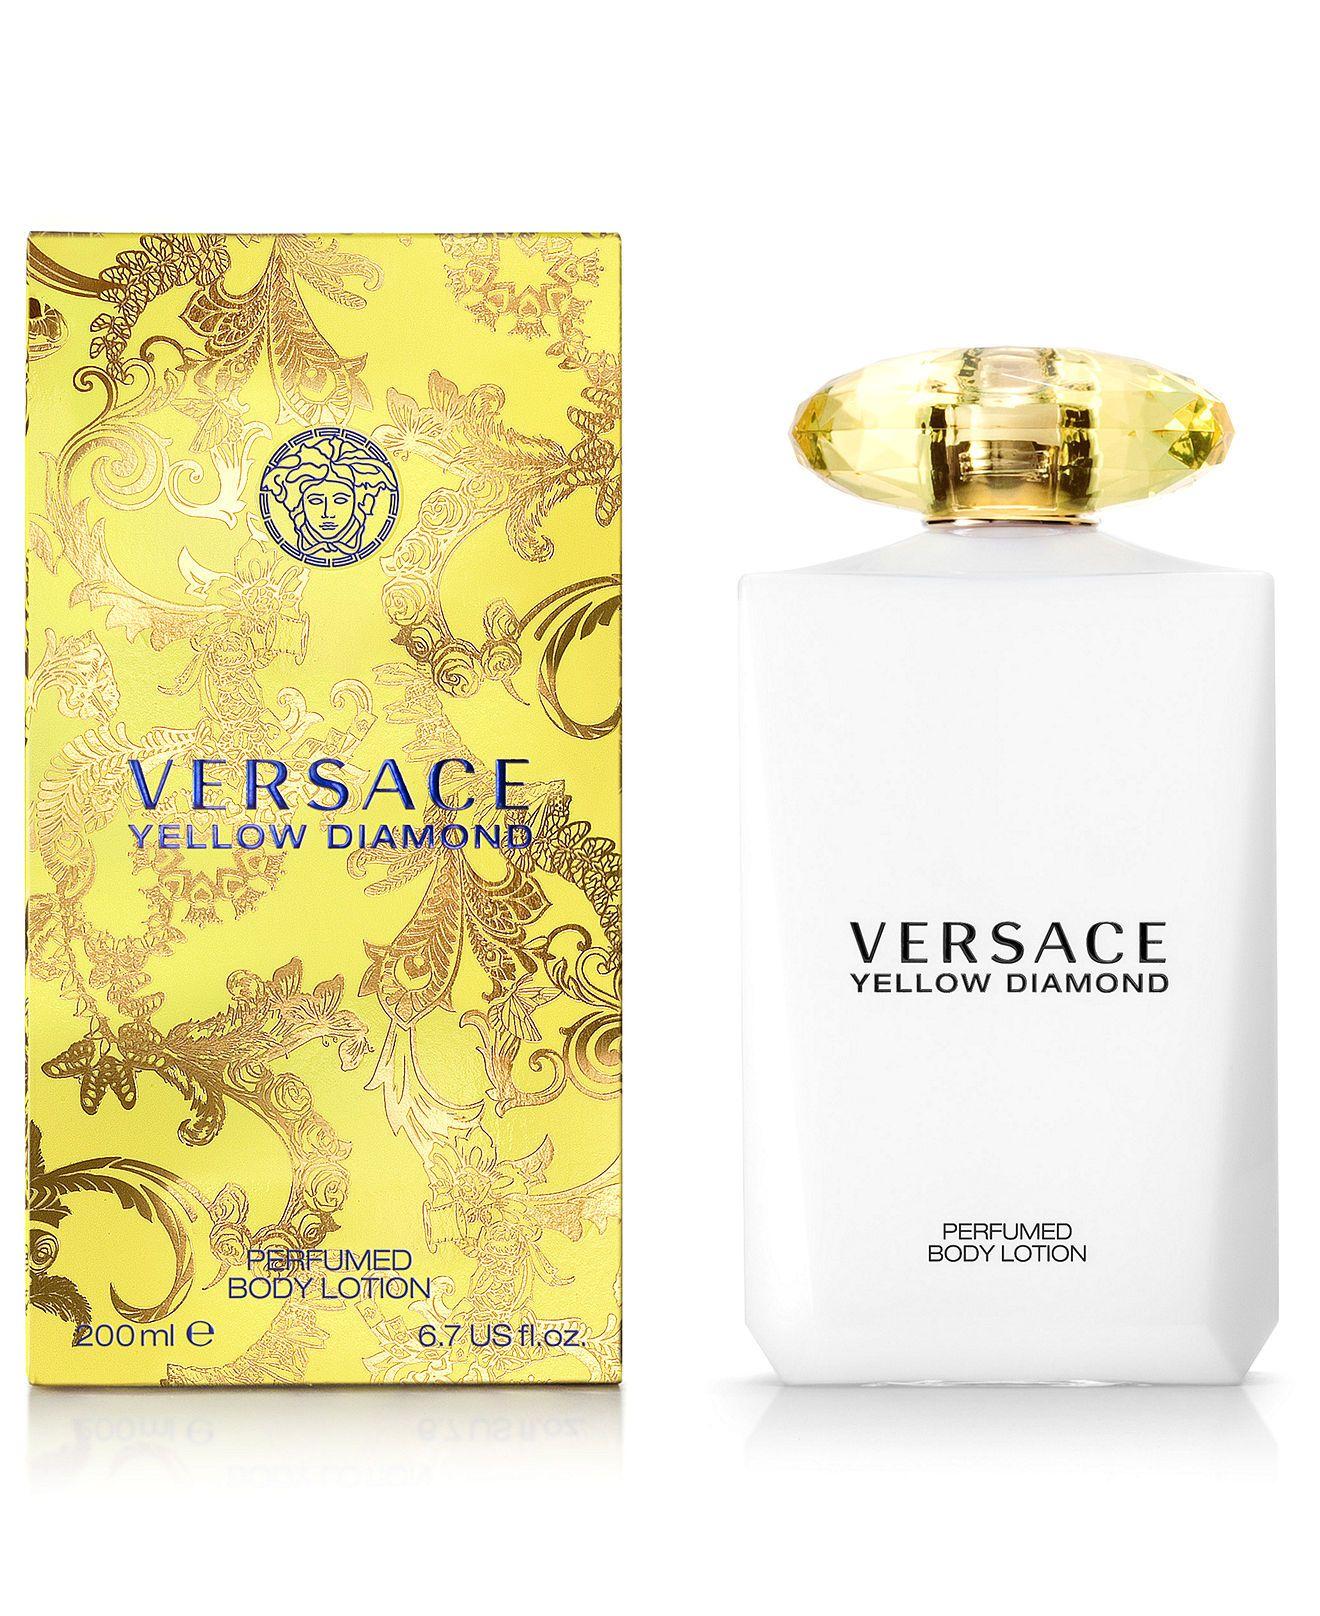 Versace Yellow Diamond Perfumed Body Lotion Body lotion